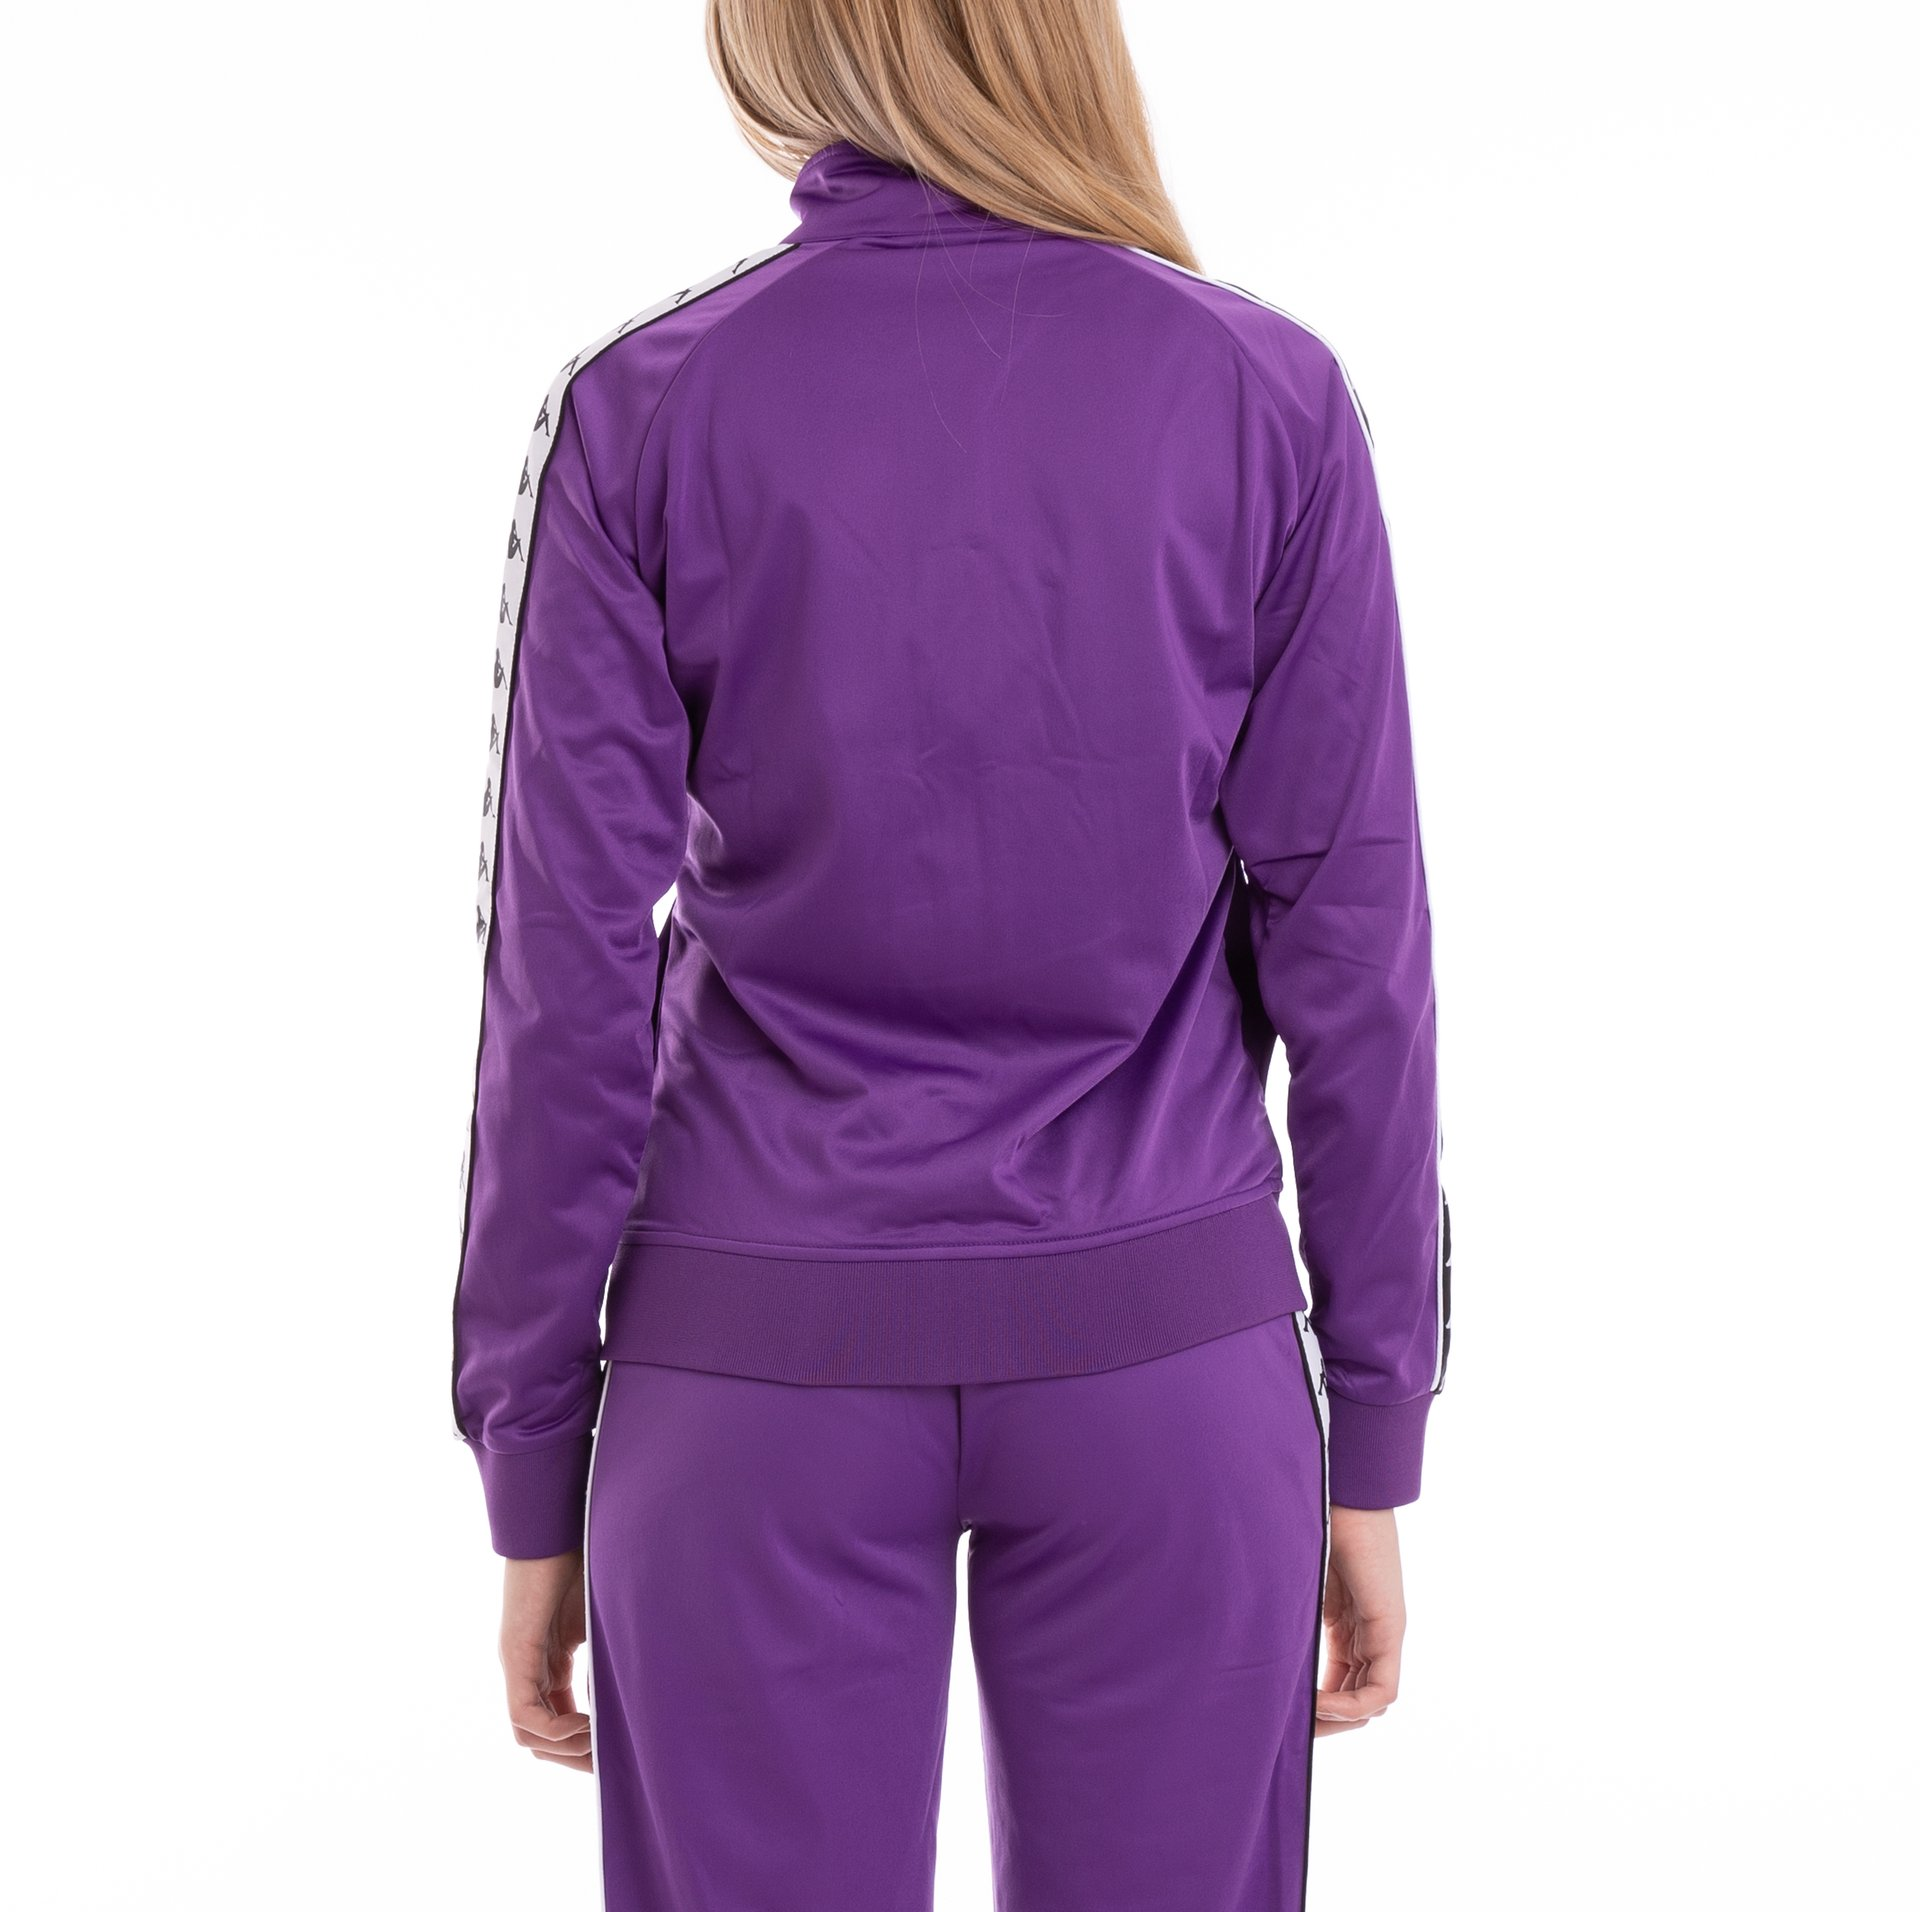 e6c2a31820 Details about Kappa Womens 222 Banda Wanniston Slim Alternating Banda Slim  Track Jacket